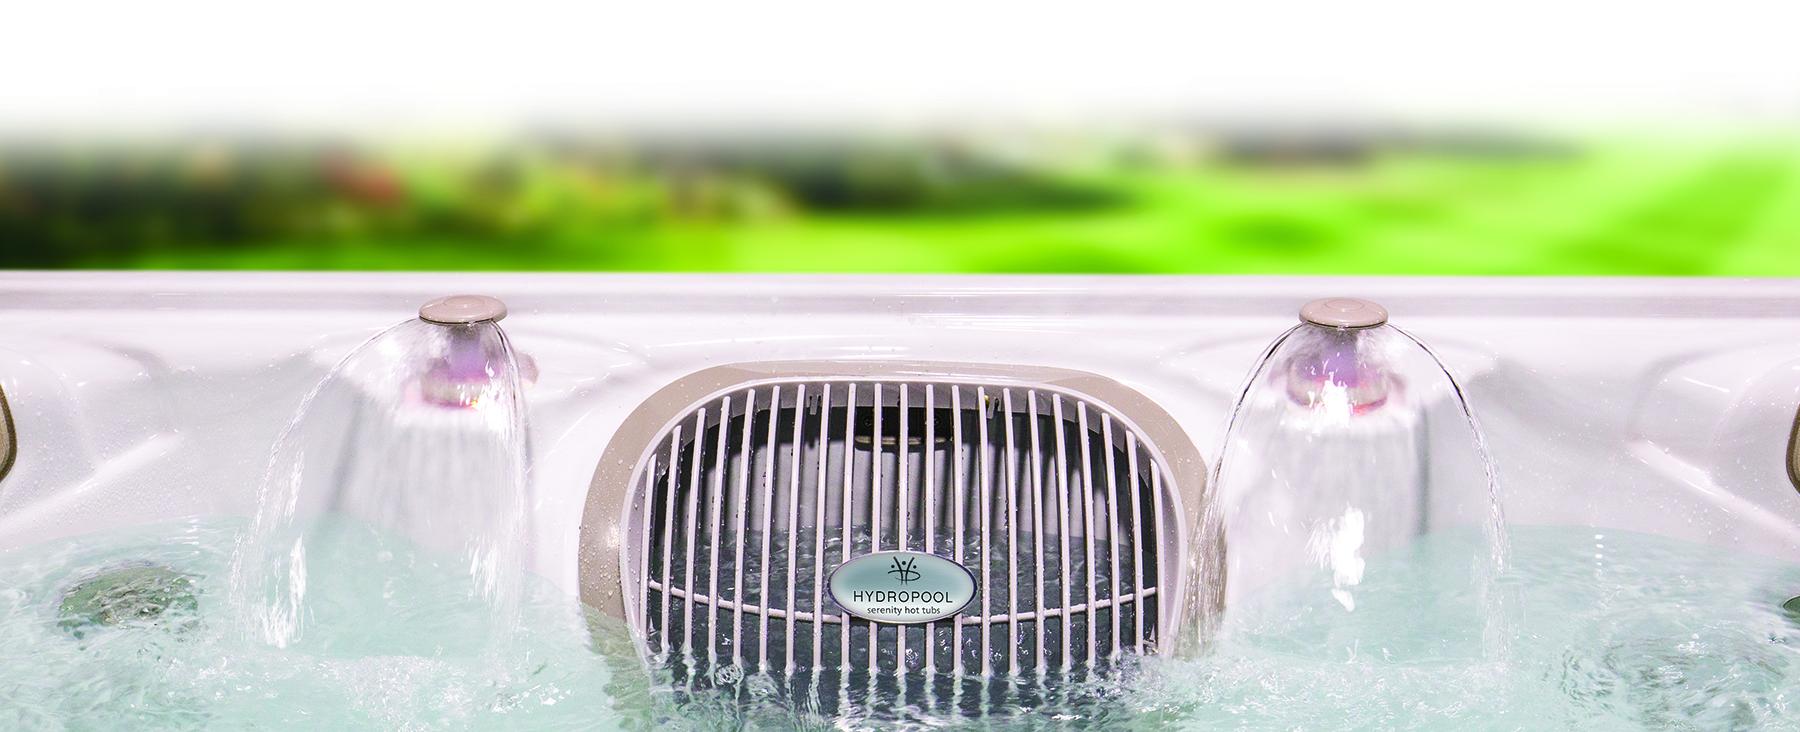 Hydropool Serenity Whirlpools